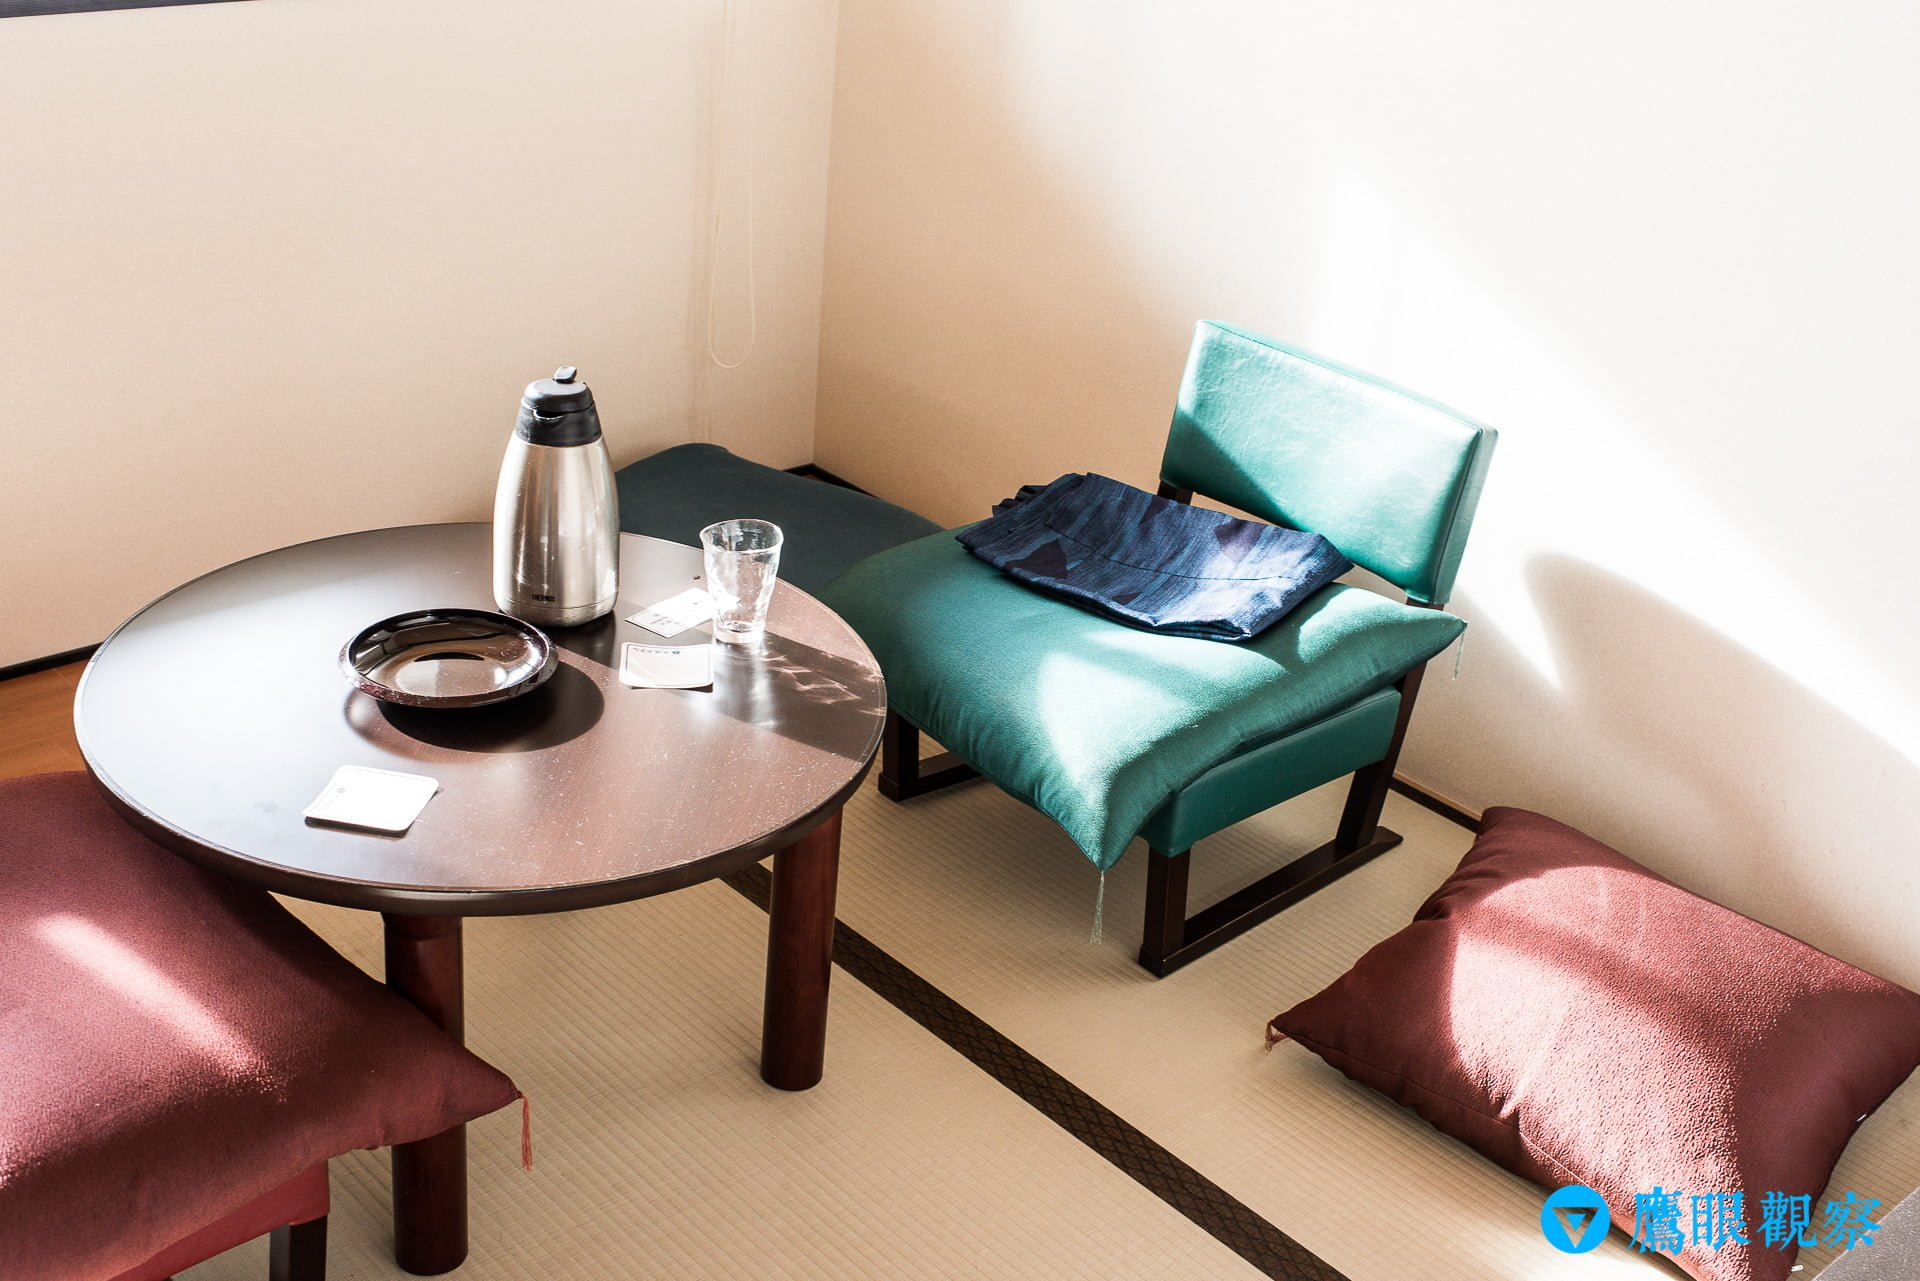 Travel Oarai Hotel in Ibaraki Prefecture Japan 90 日本茨城縣/東茨城/大洗飯店(大洗ホテル)/旅館推薦與住宿旅遊心得分享